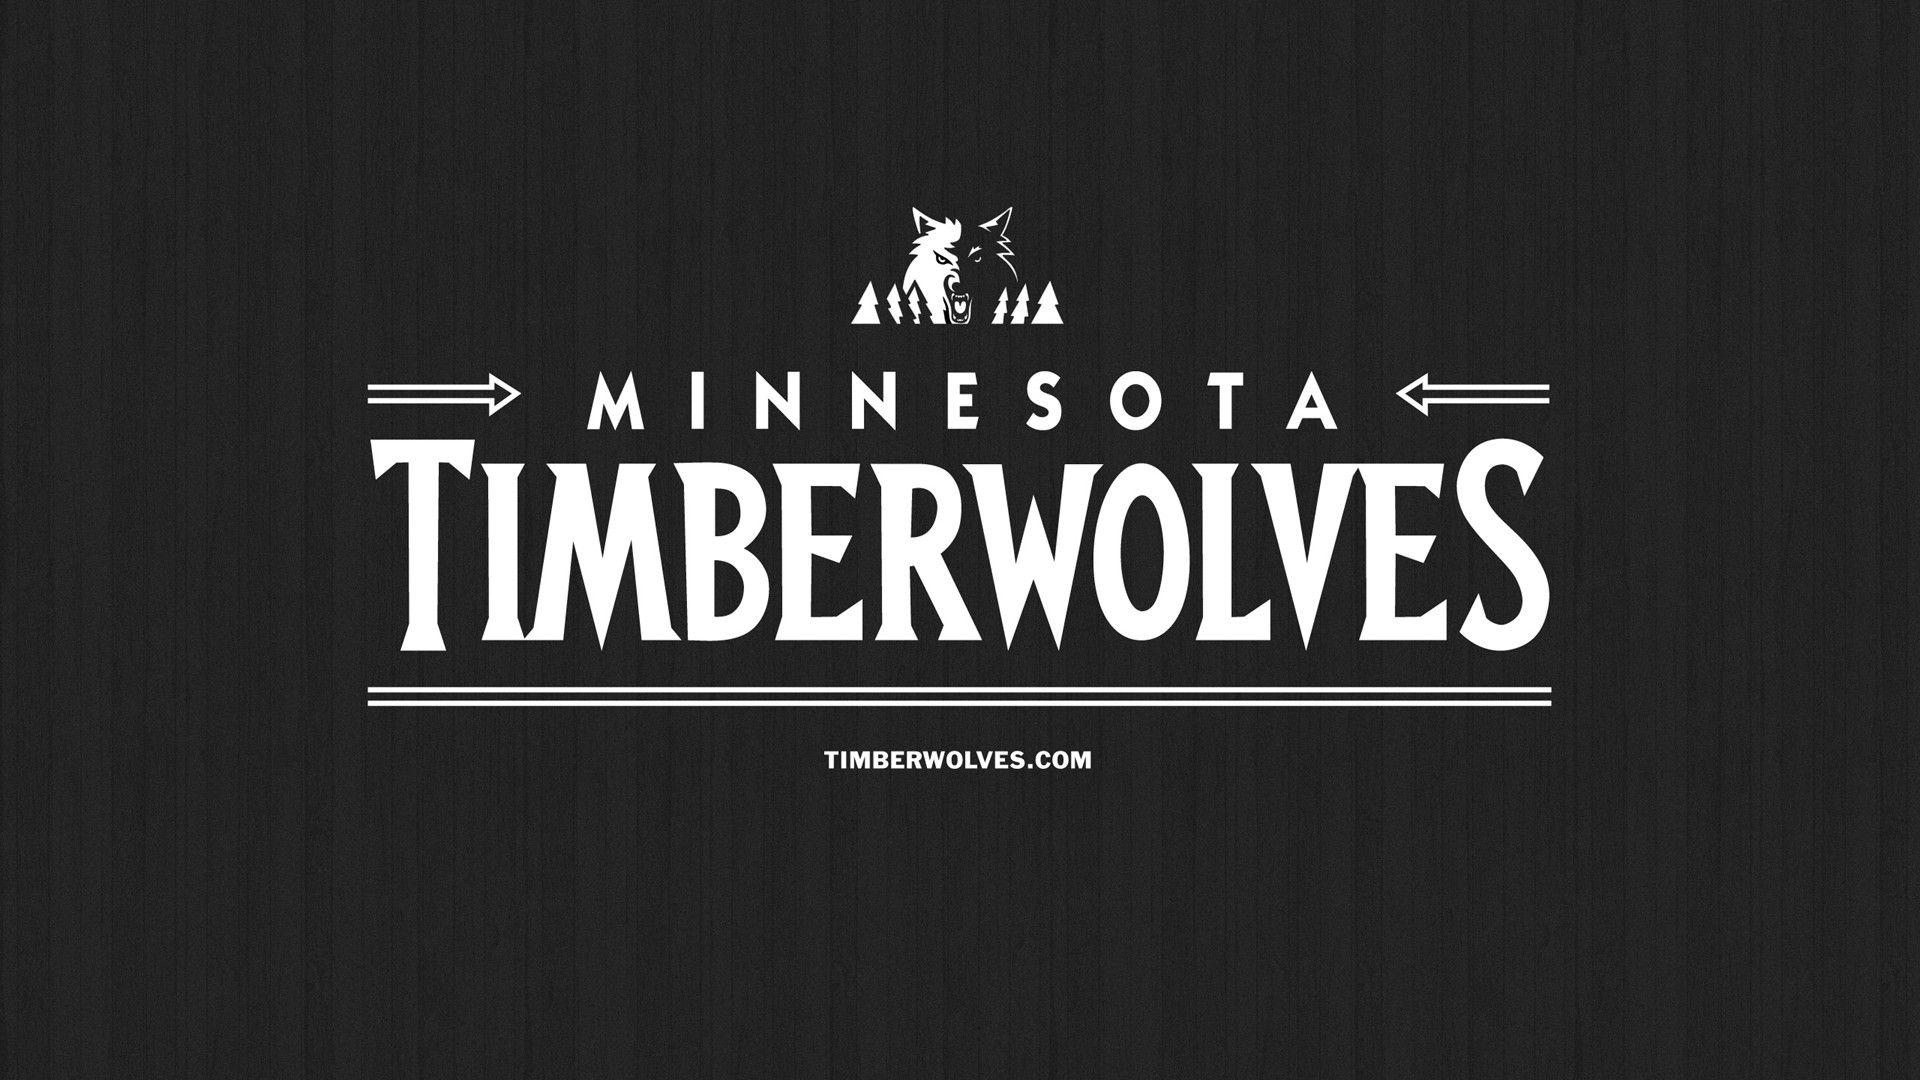 Minnesota Timberwolves full hd wallpaper download